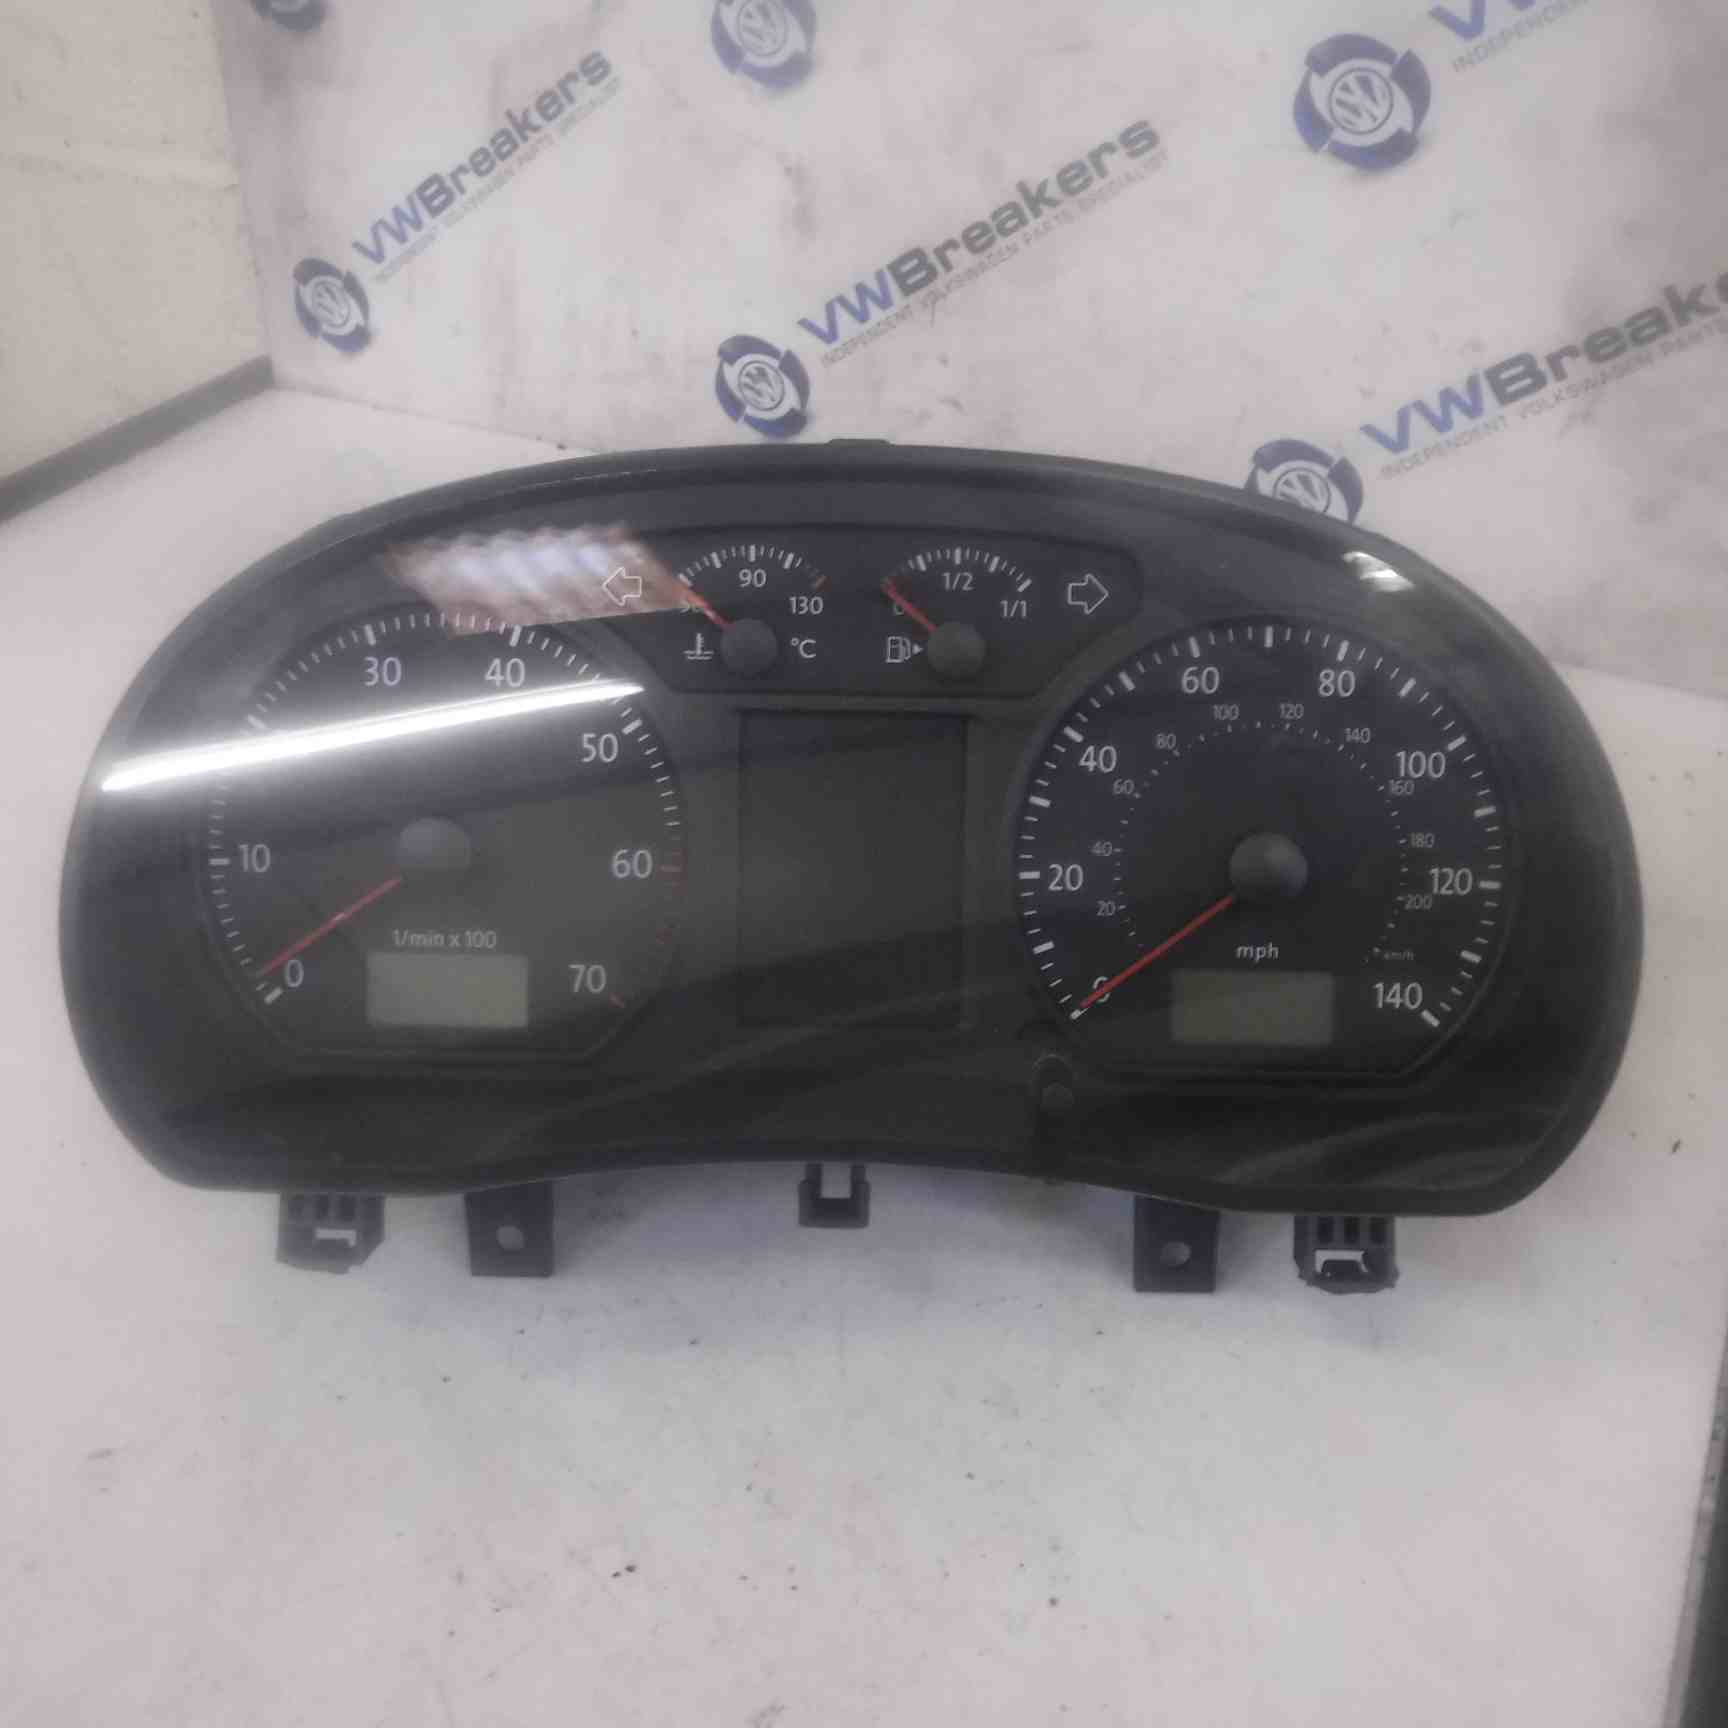 Volkswagen Polo 9N3 2006-2008 Instrument Panel Dials Cluster Clocks108K